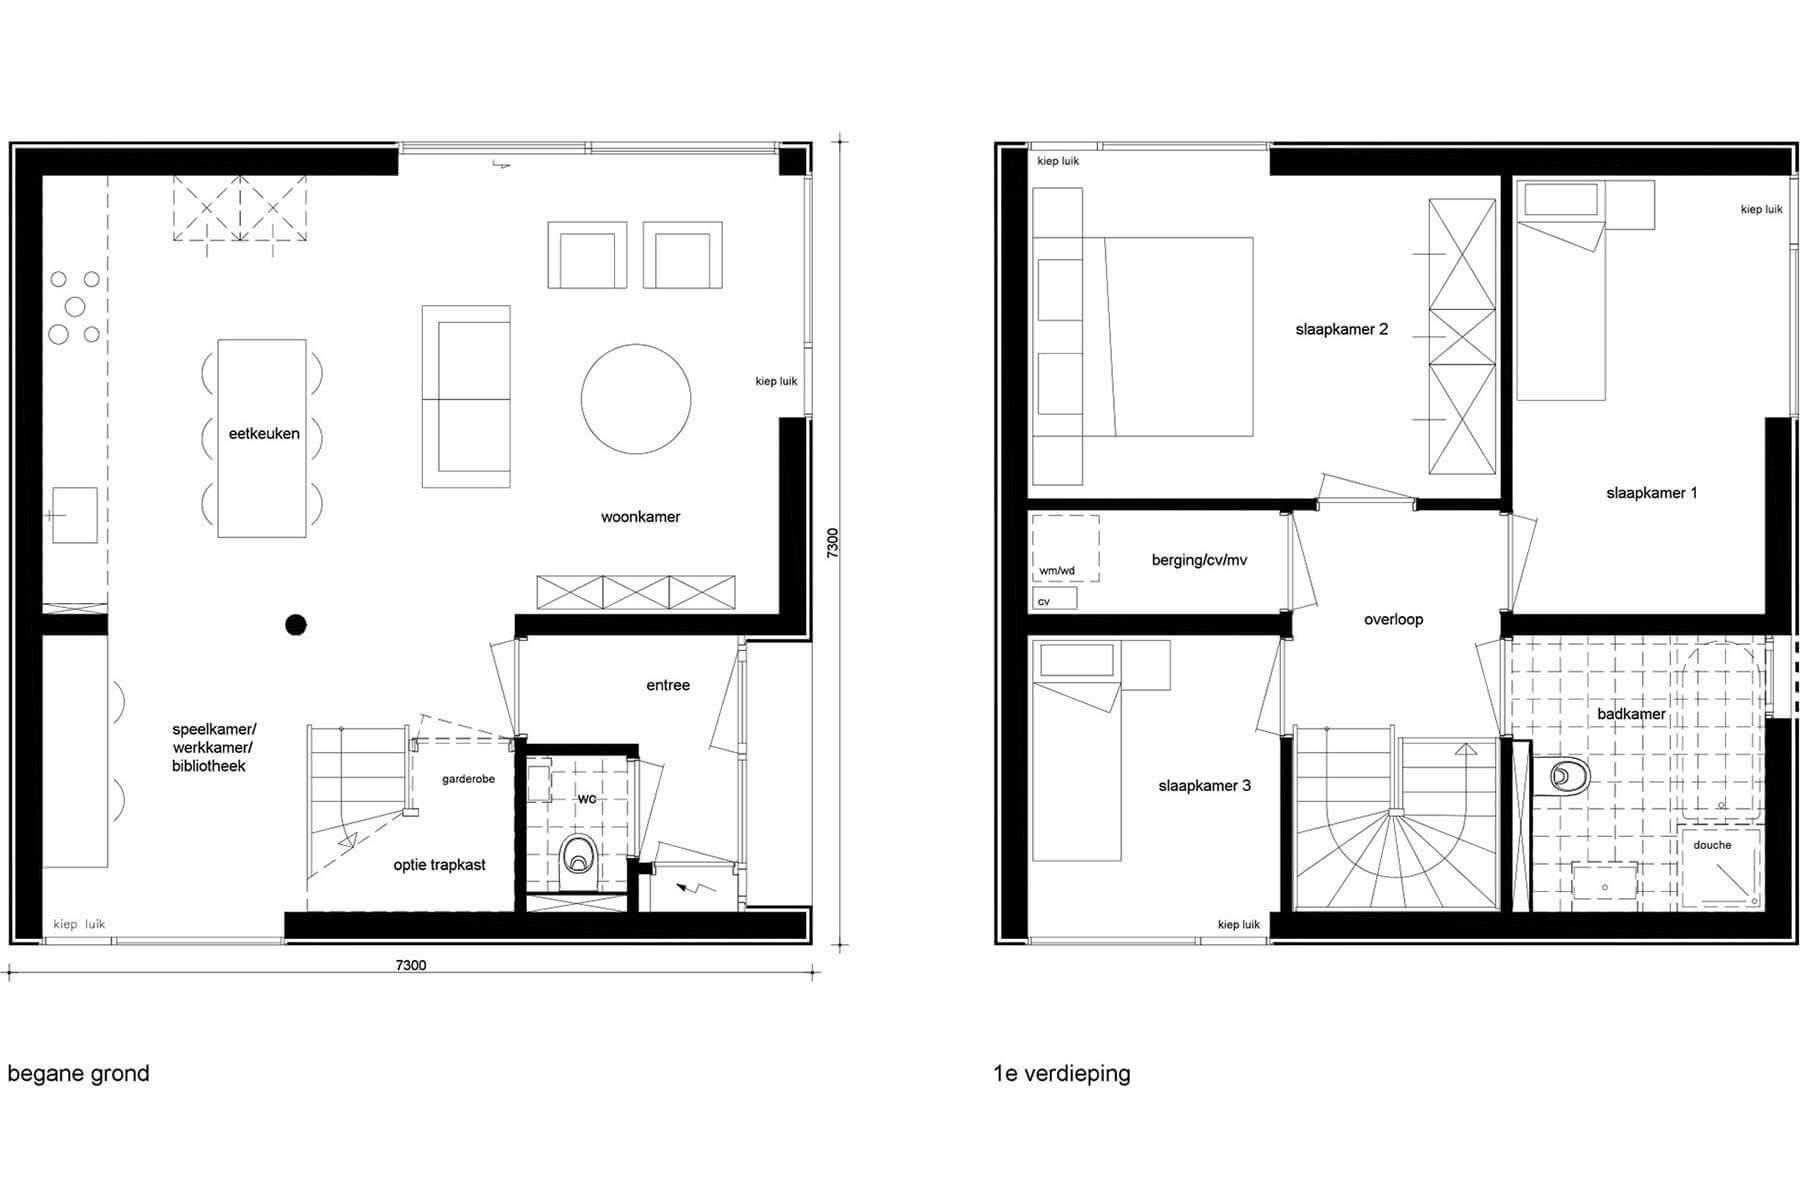 8A-Architecten-cube-house-03